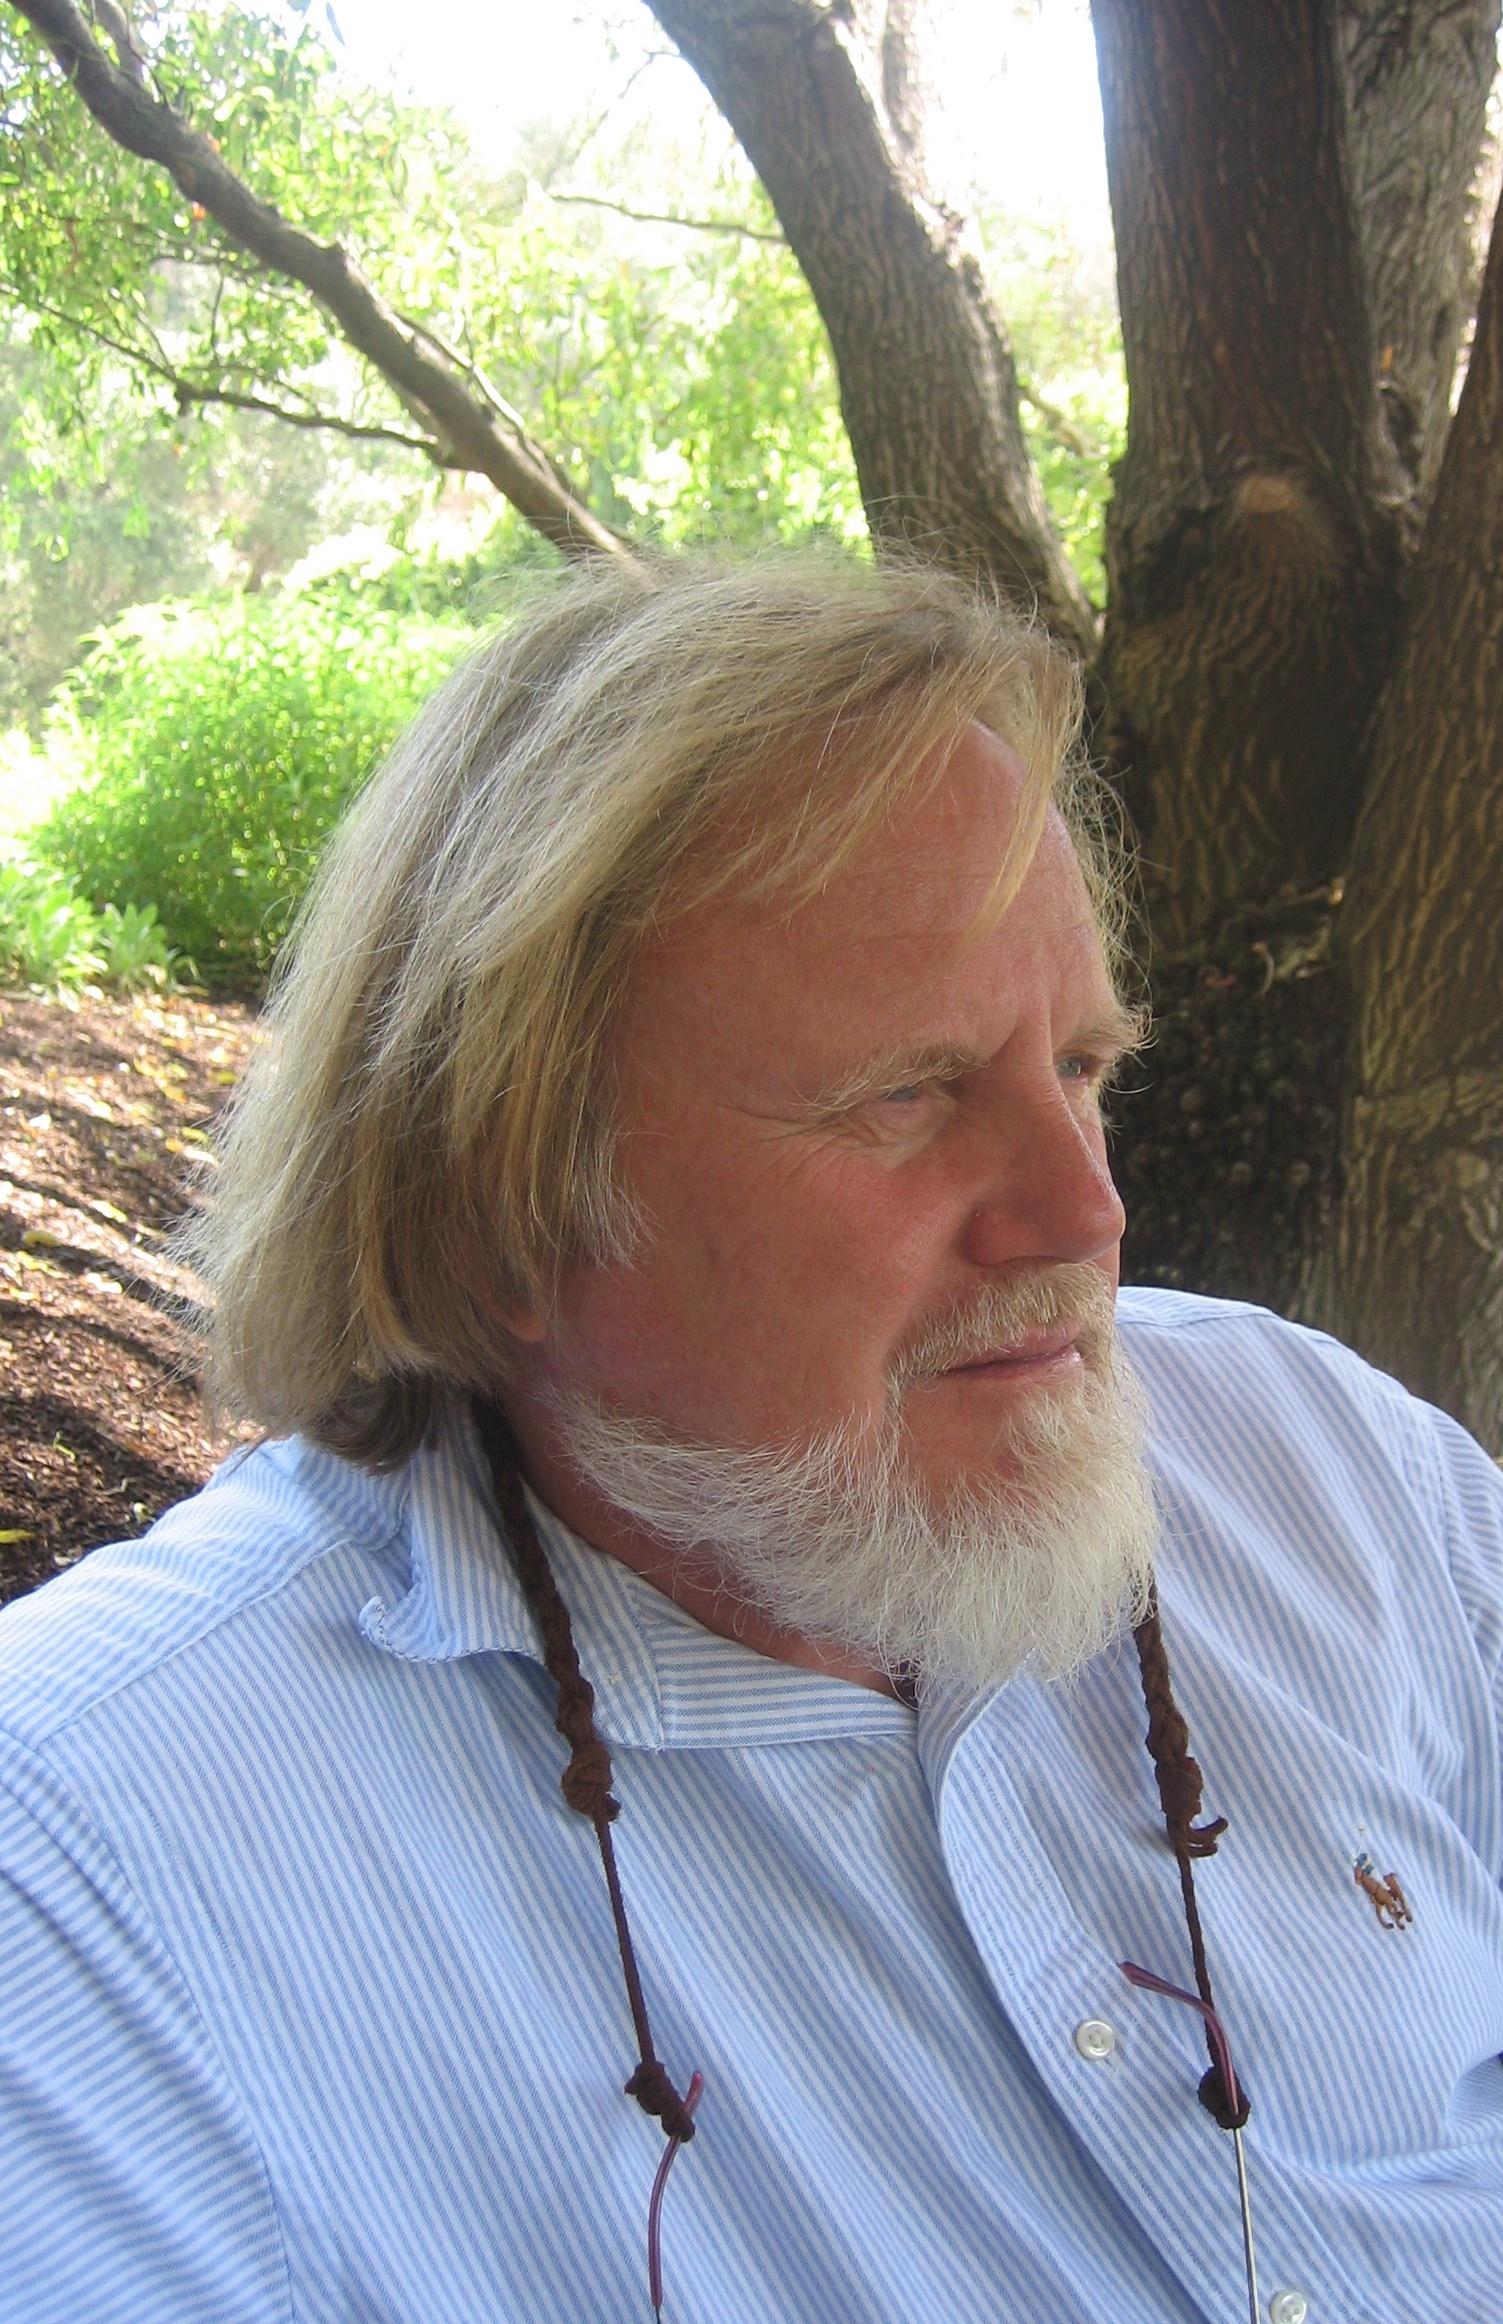 The artist on retreat in Napa Valley, California